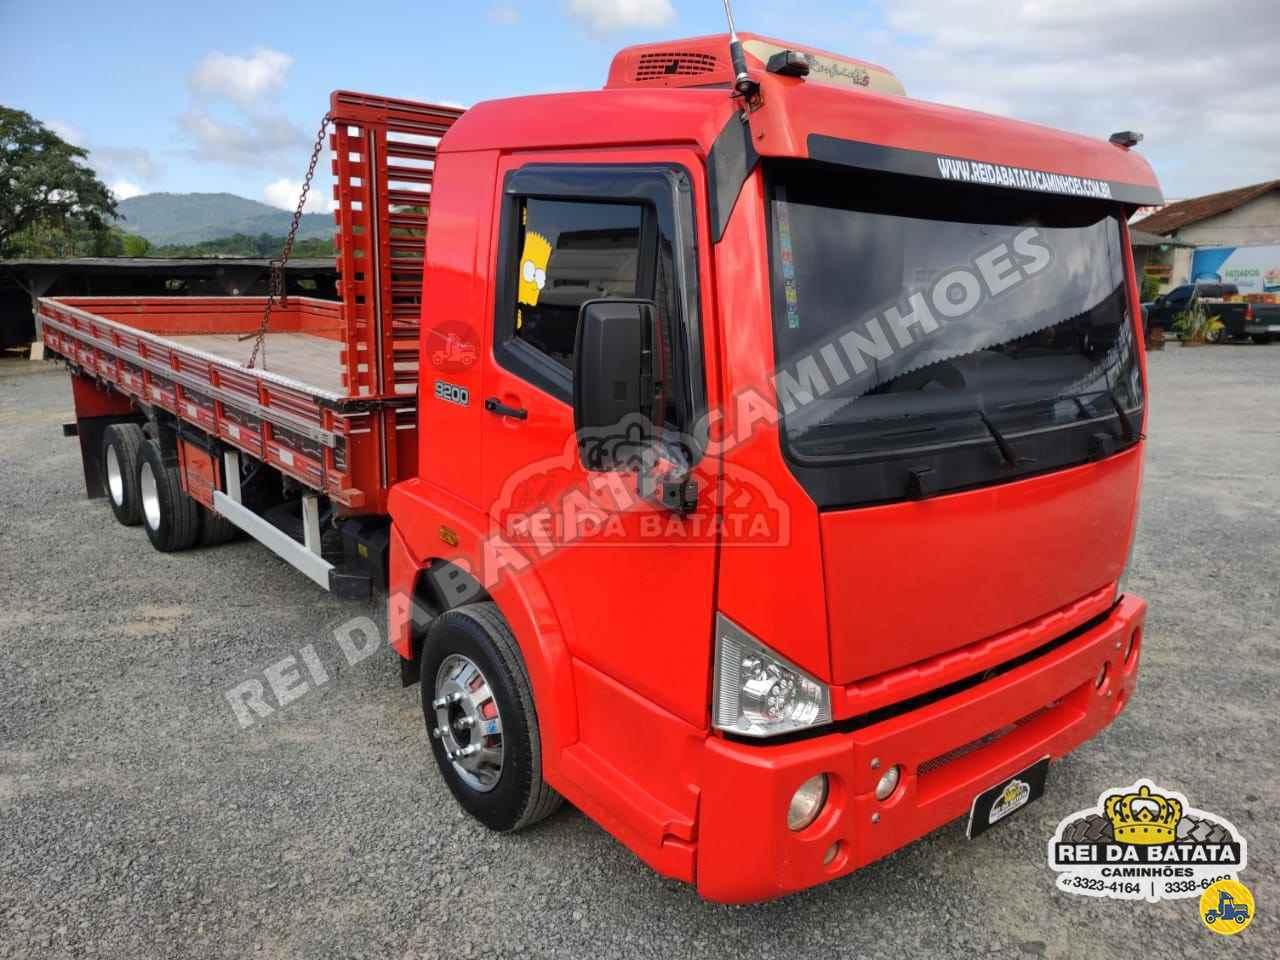 AGRALE AGRALE 9200 197000km 2011/2011 Rei da Batata Caminhões